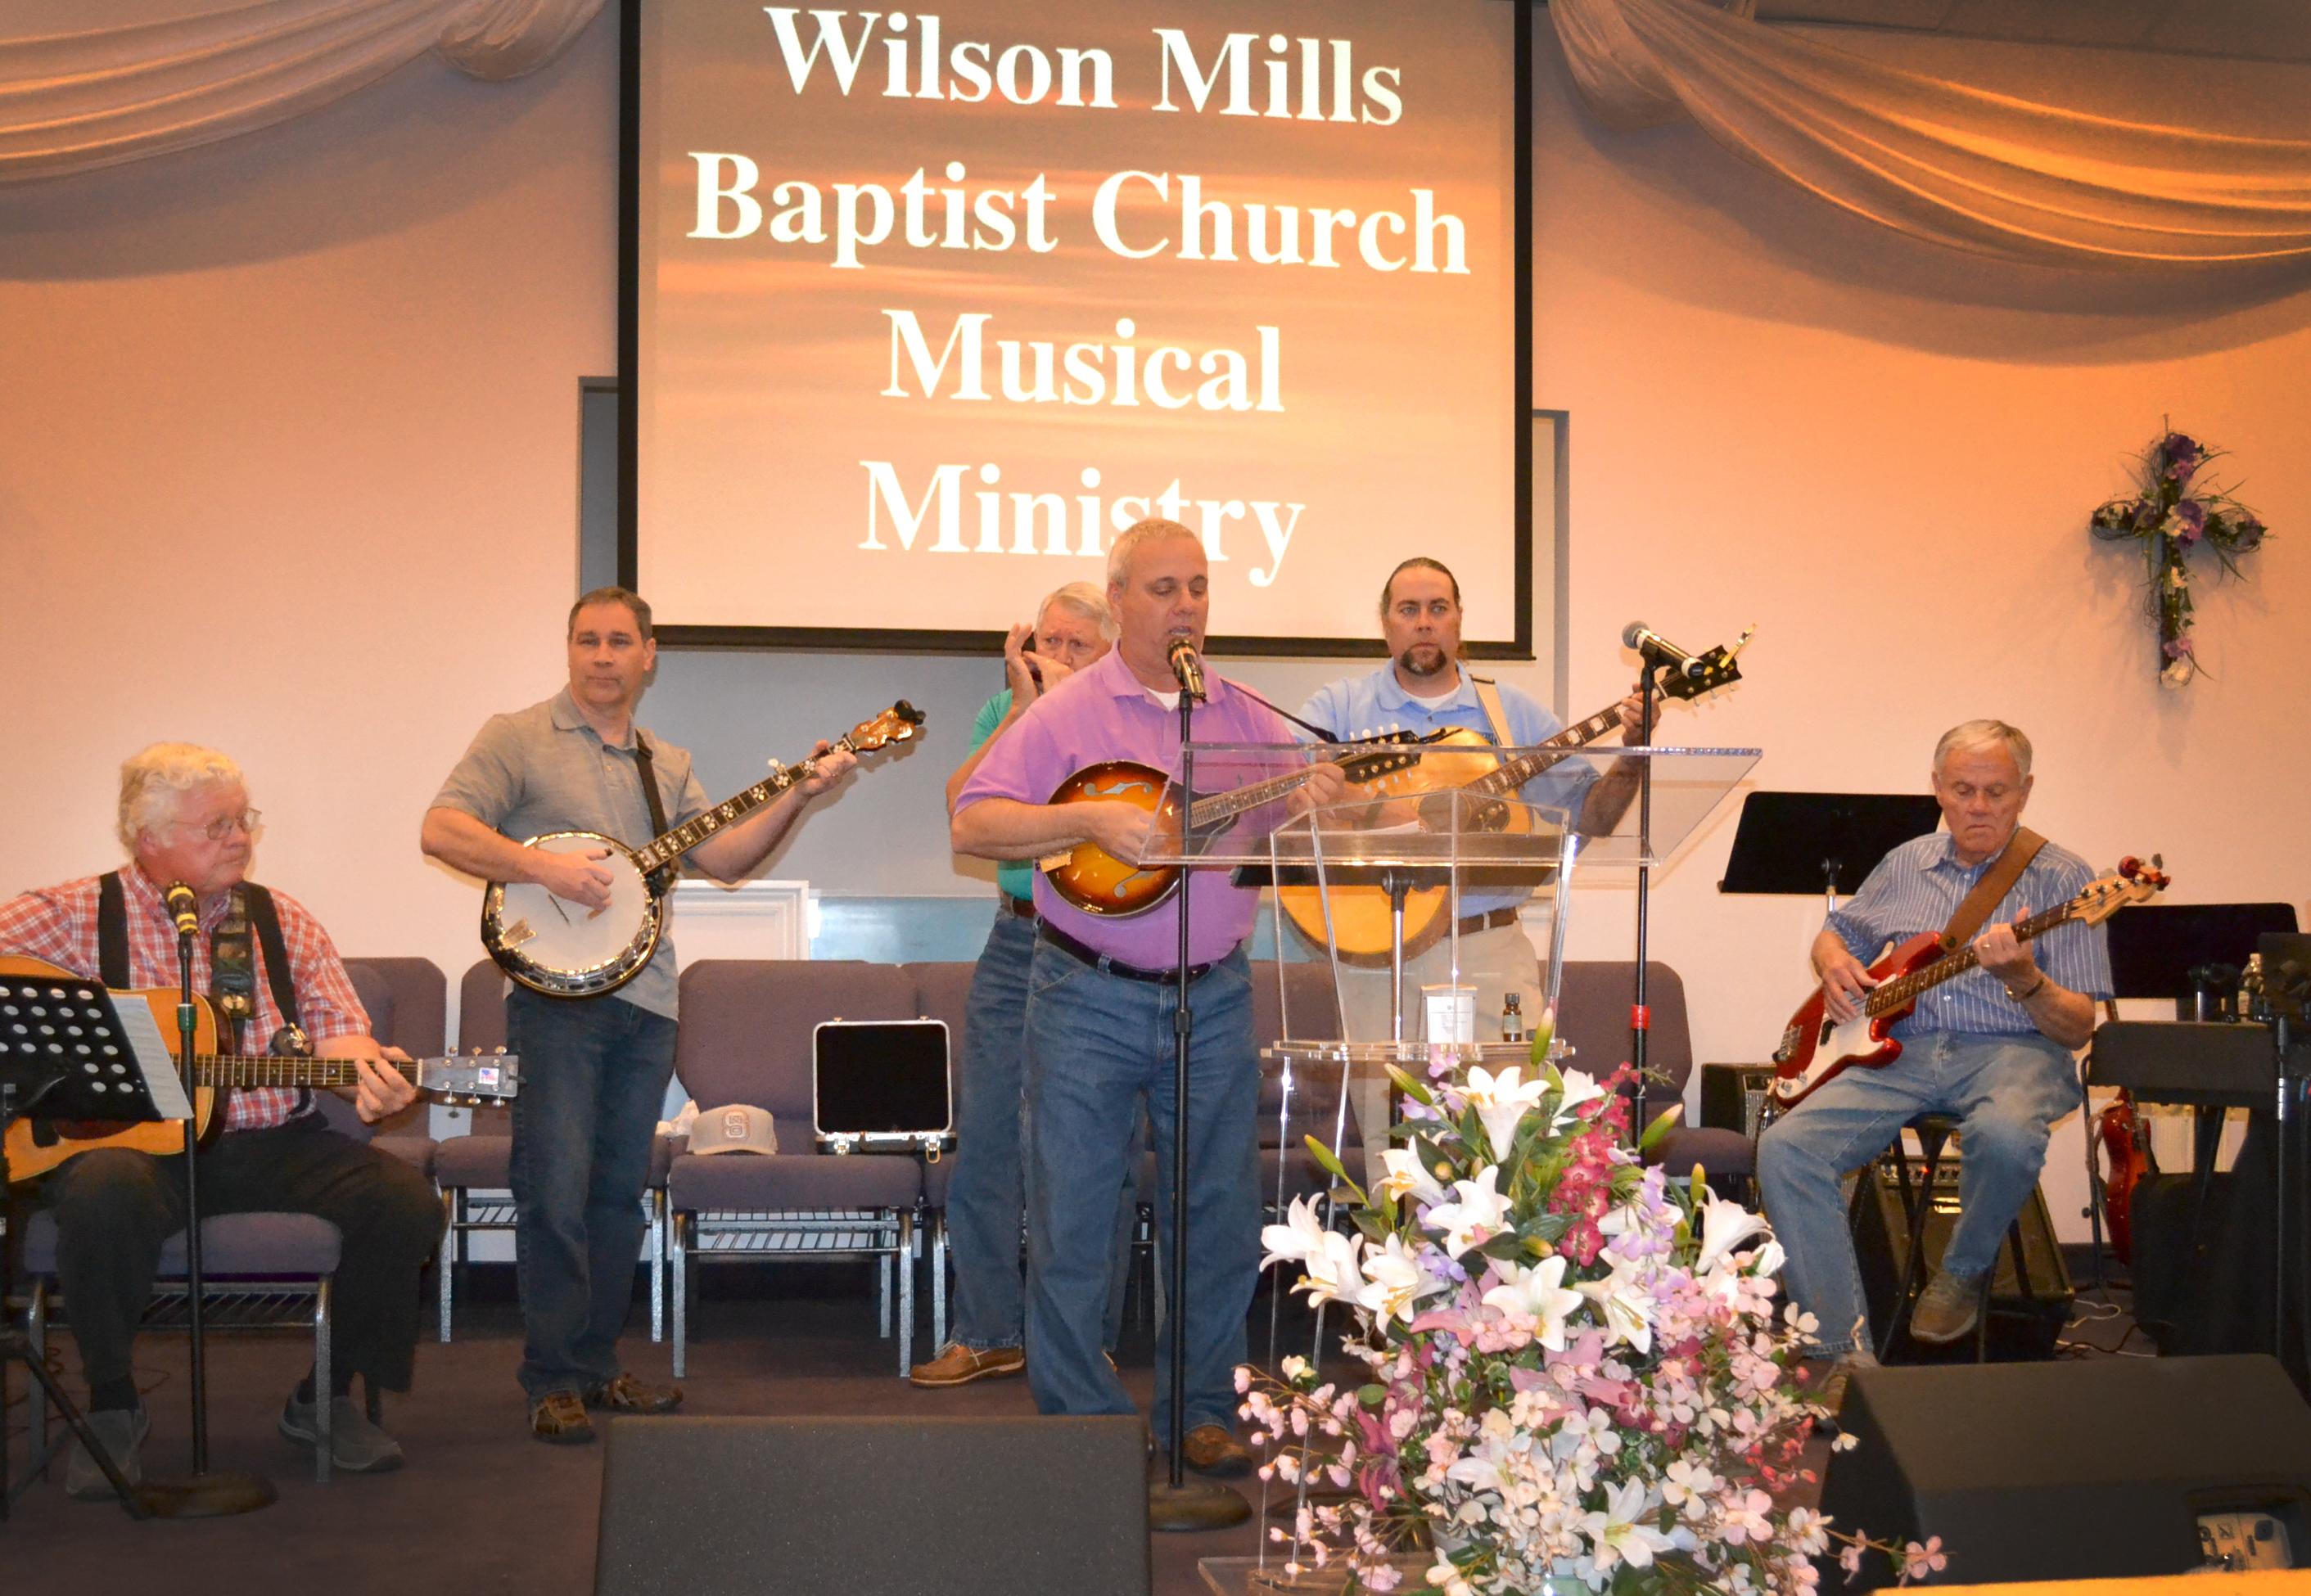 WM Baptist Ch Ministry